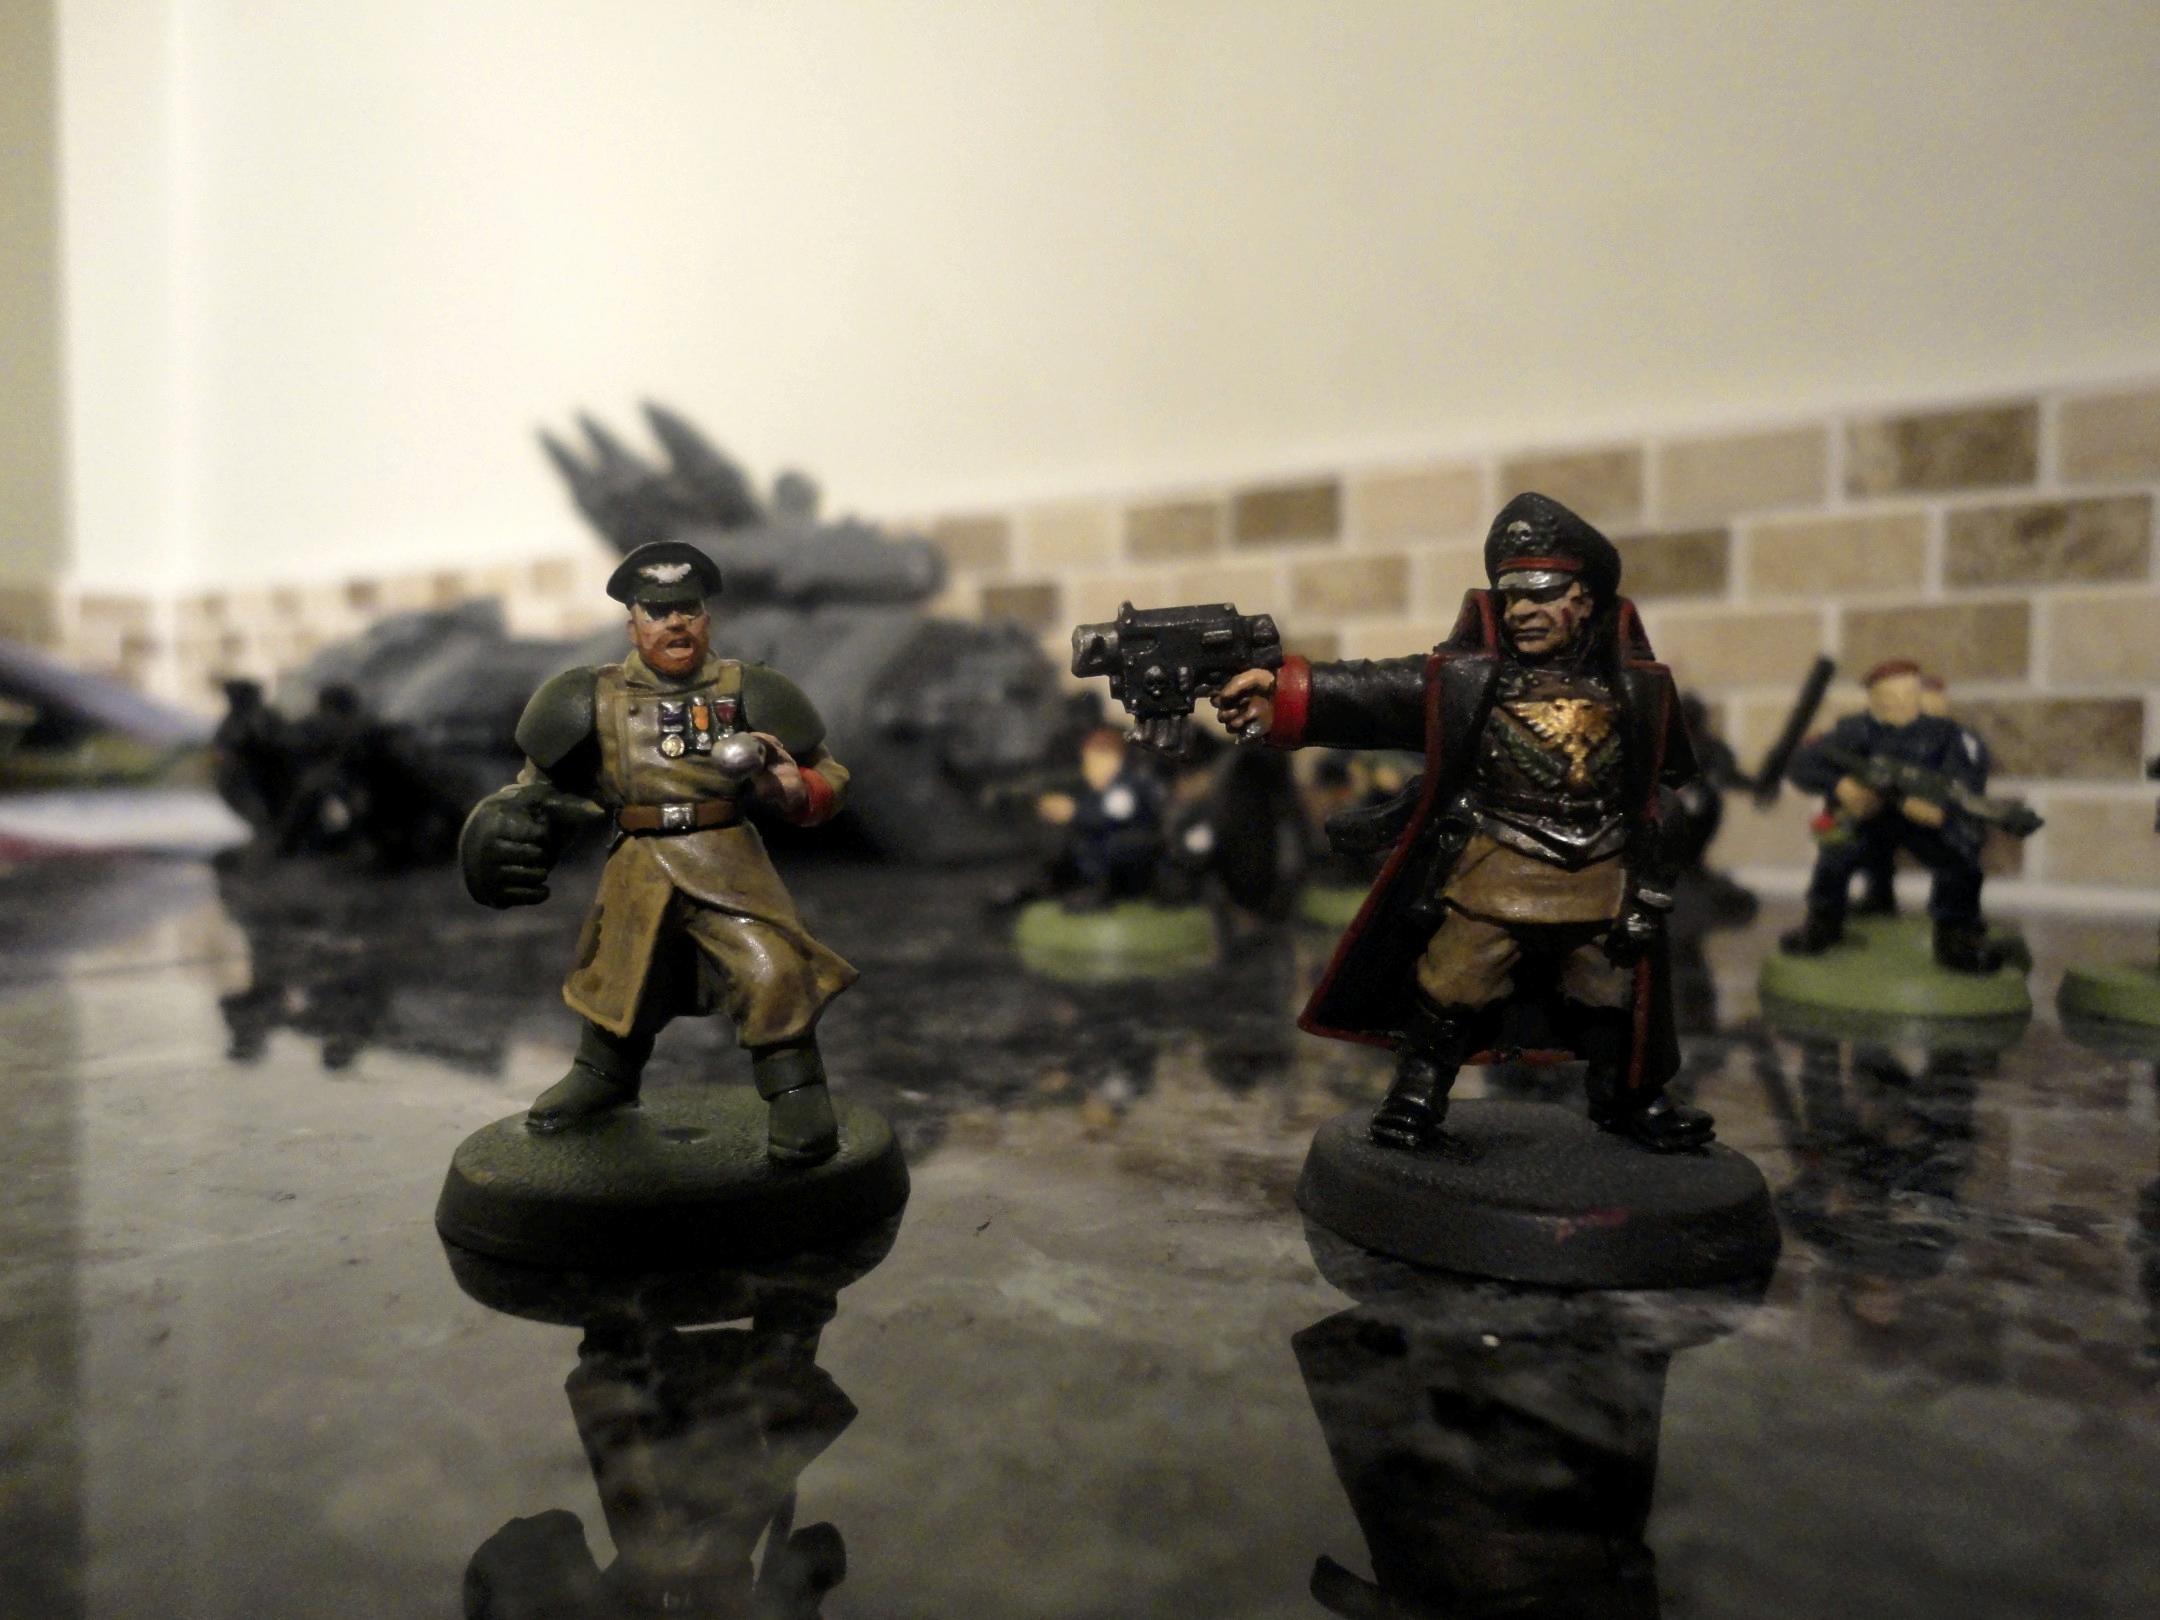 Commander, Commissar, Imperial Guard